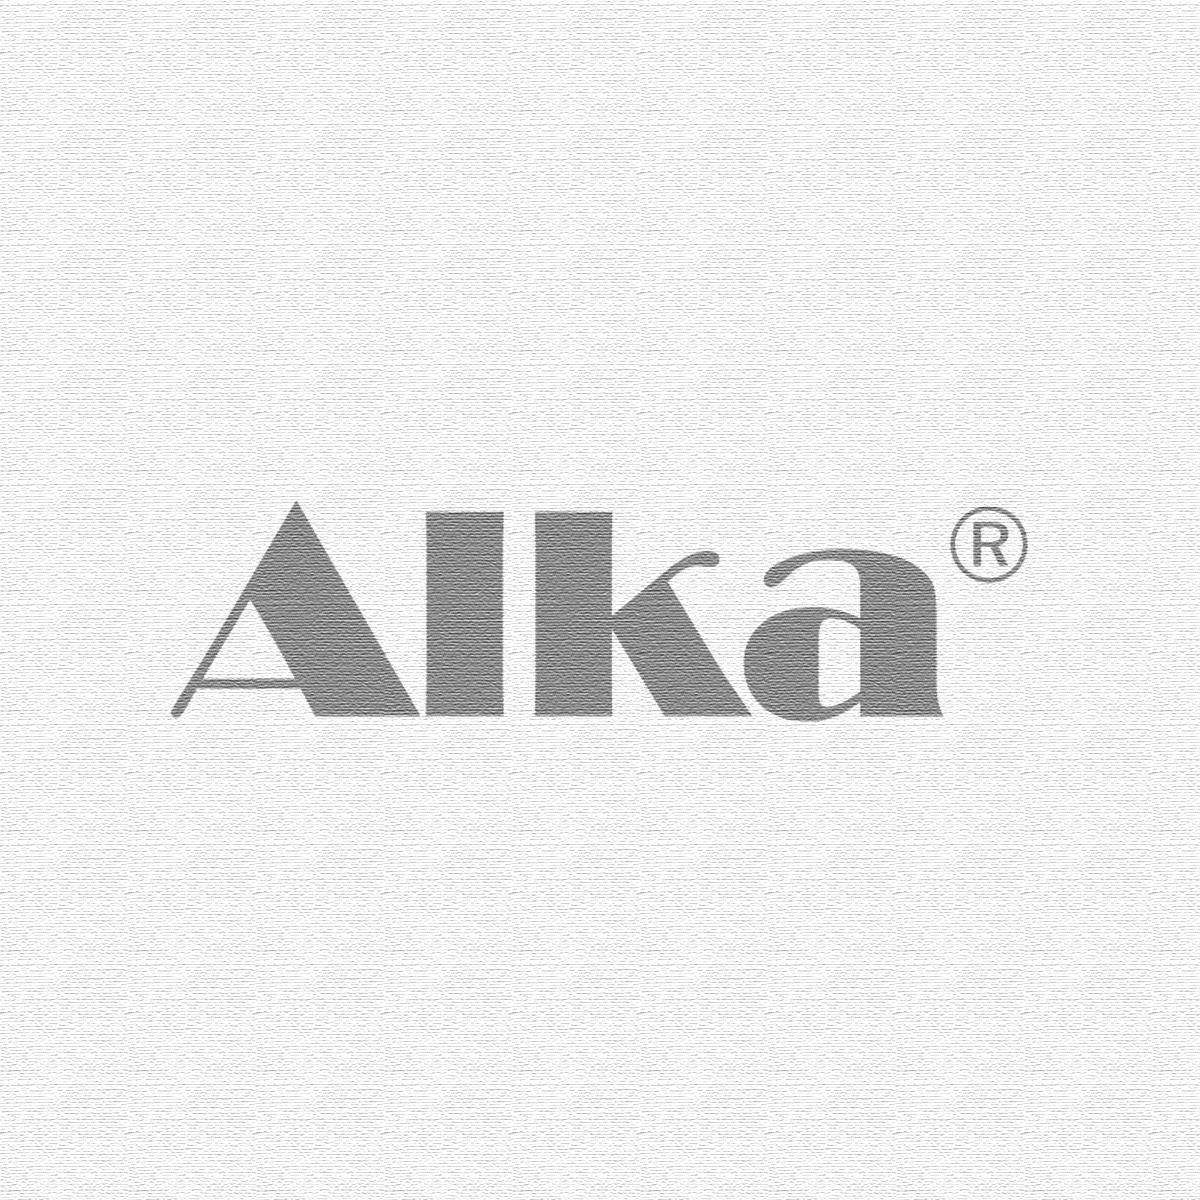 Alka® Drops - 37ml - Spanish label